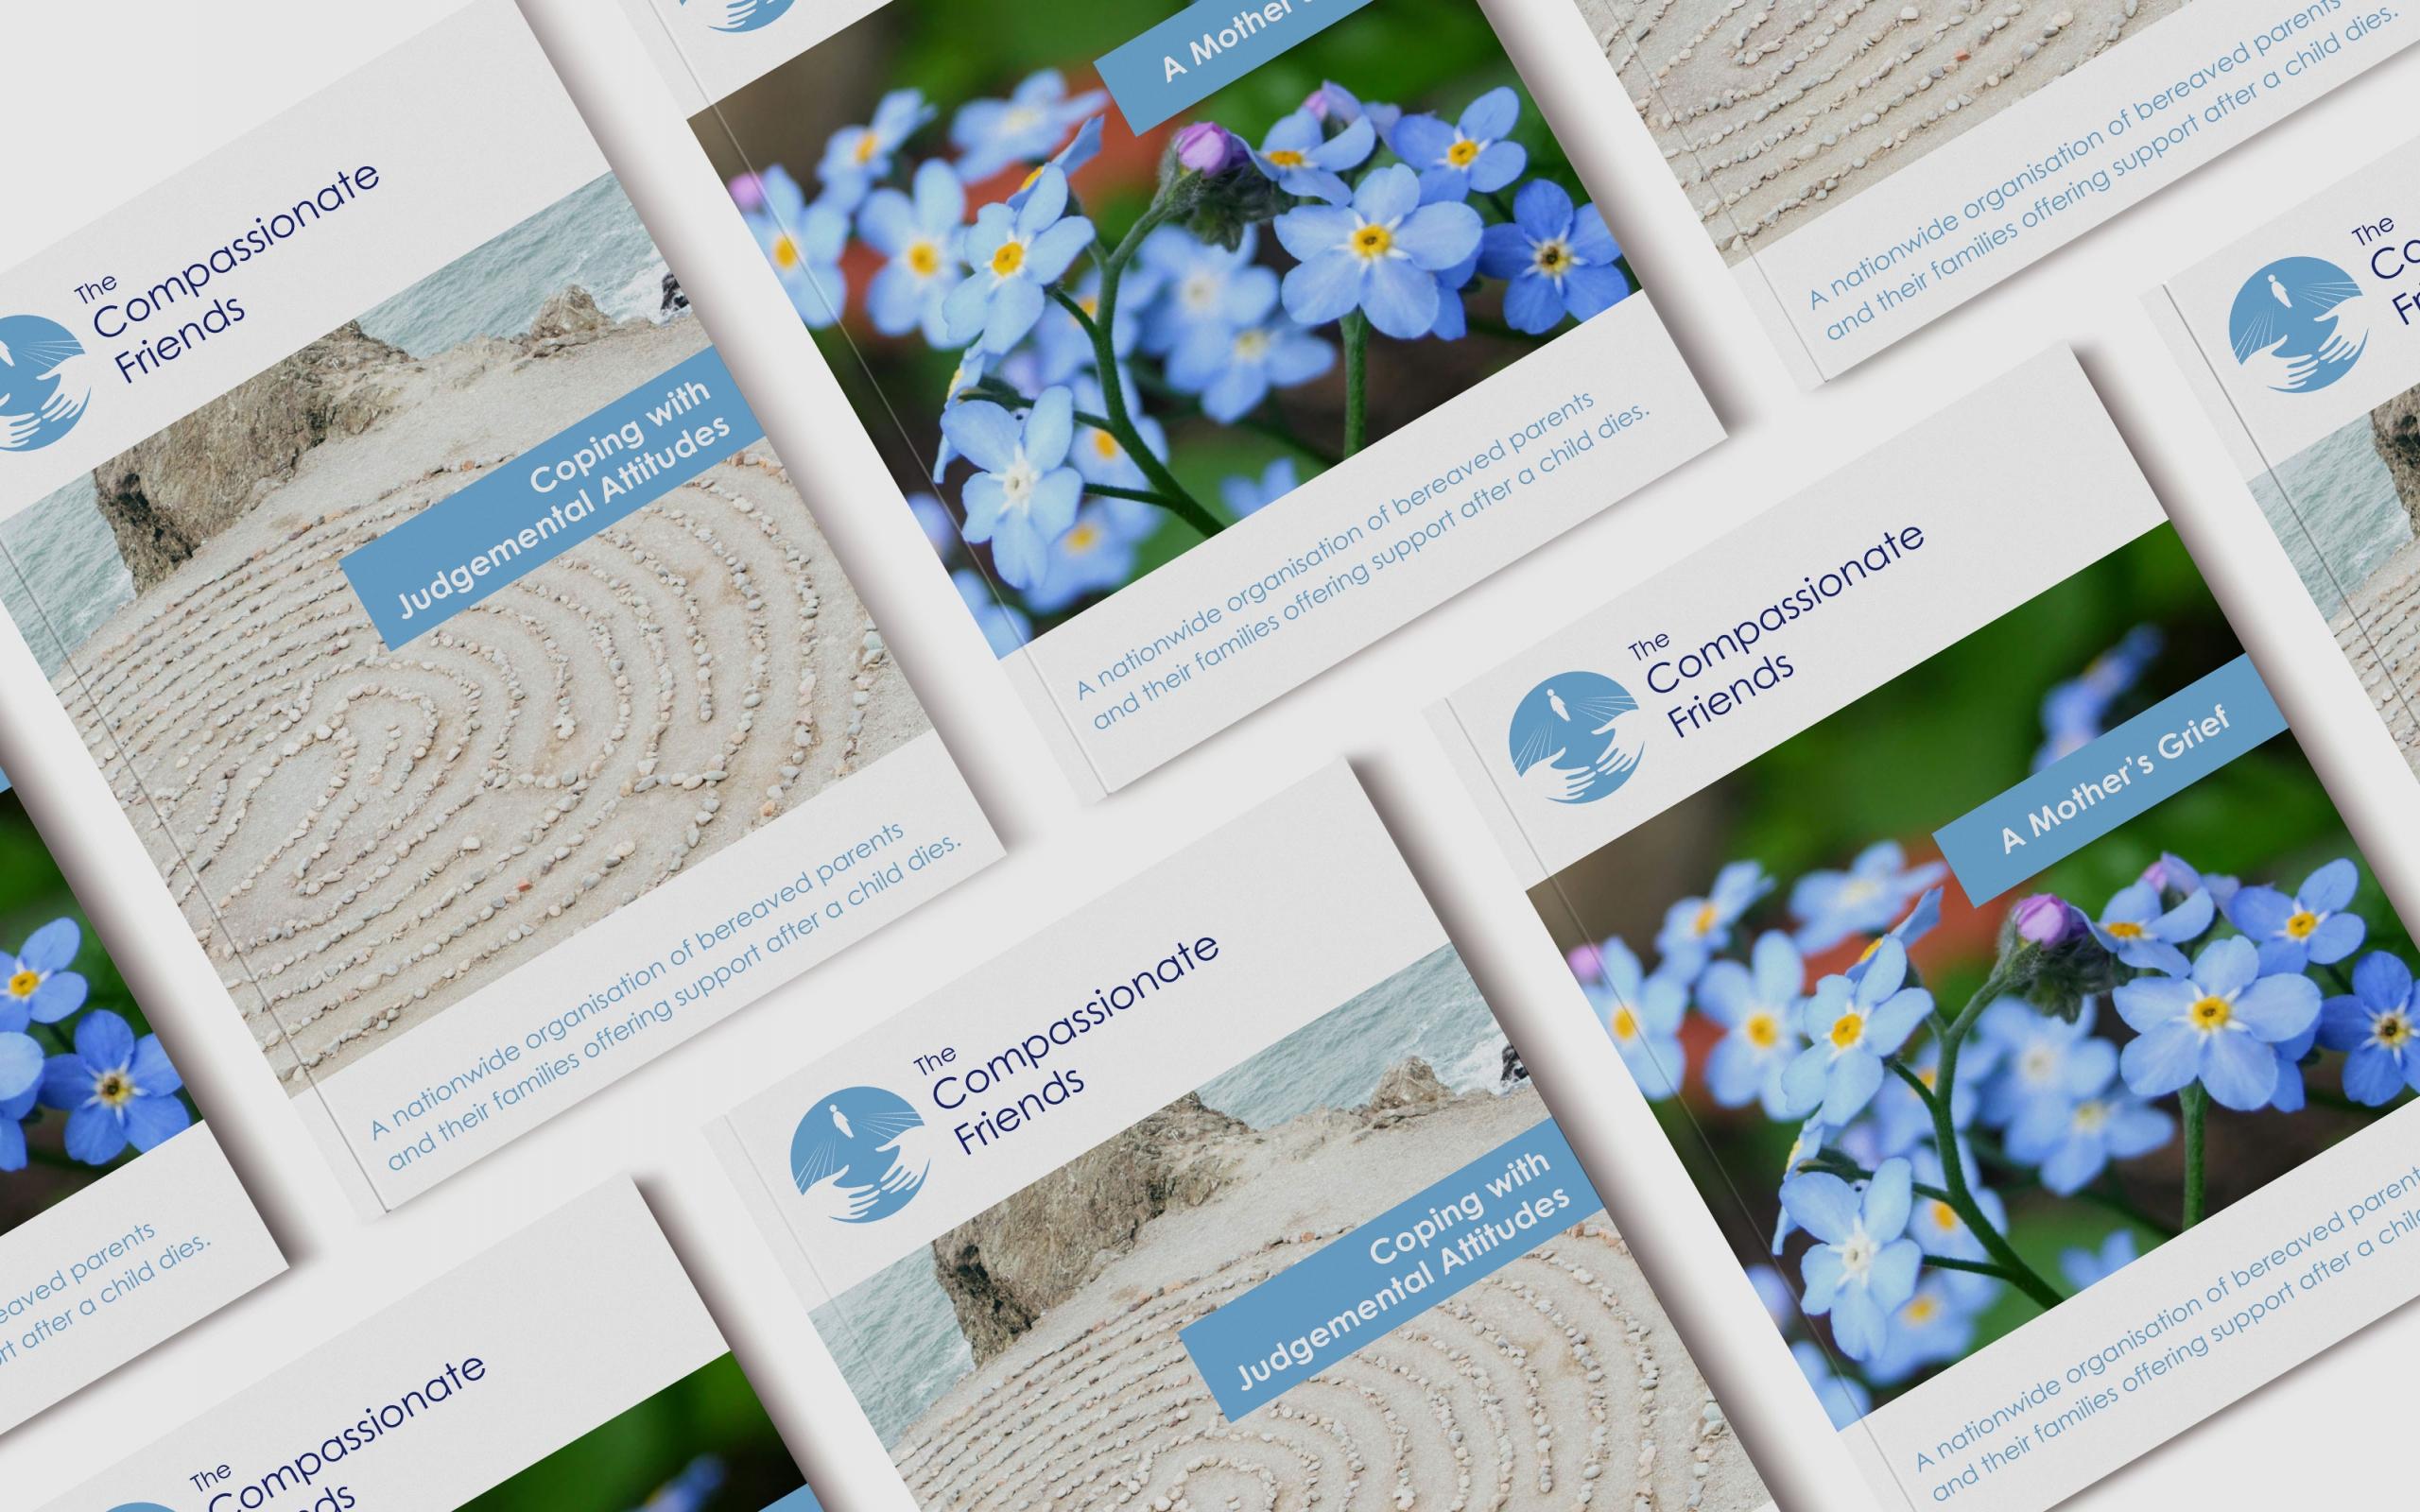 TCF leaflets